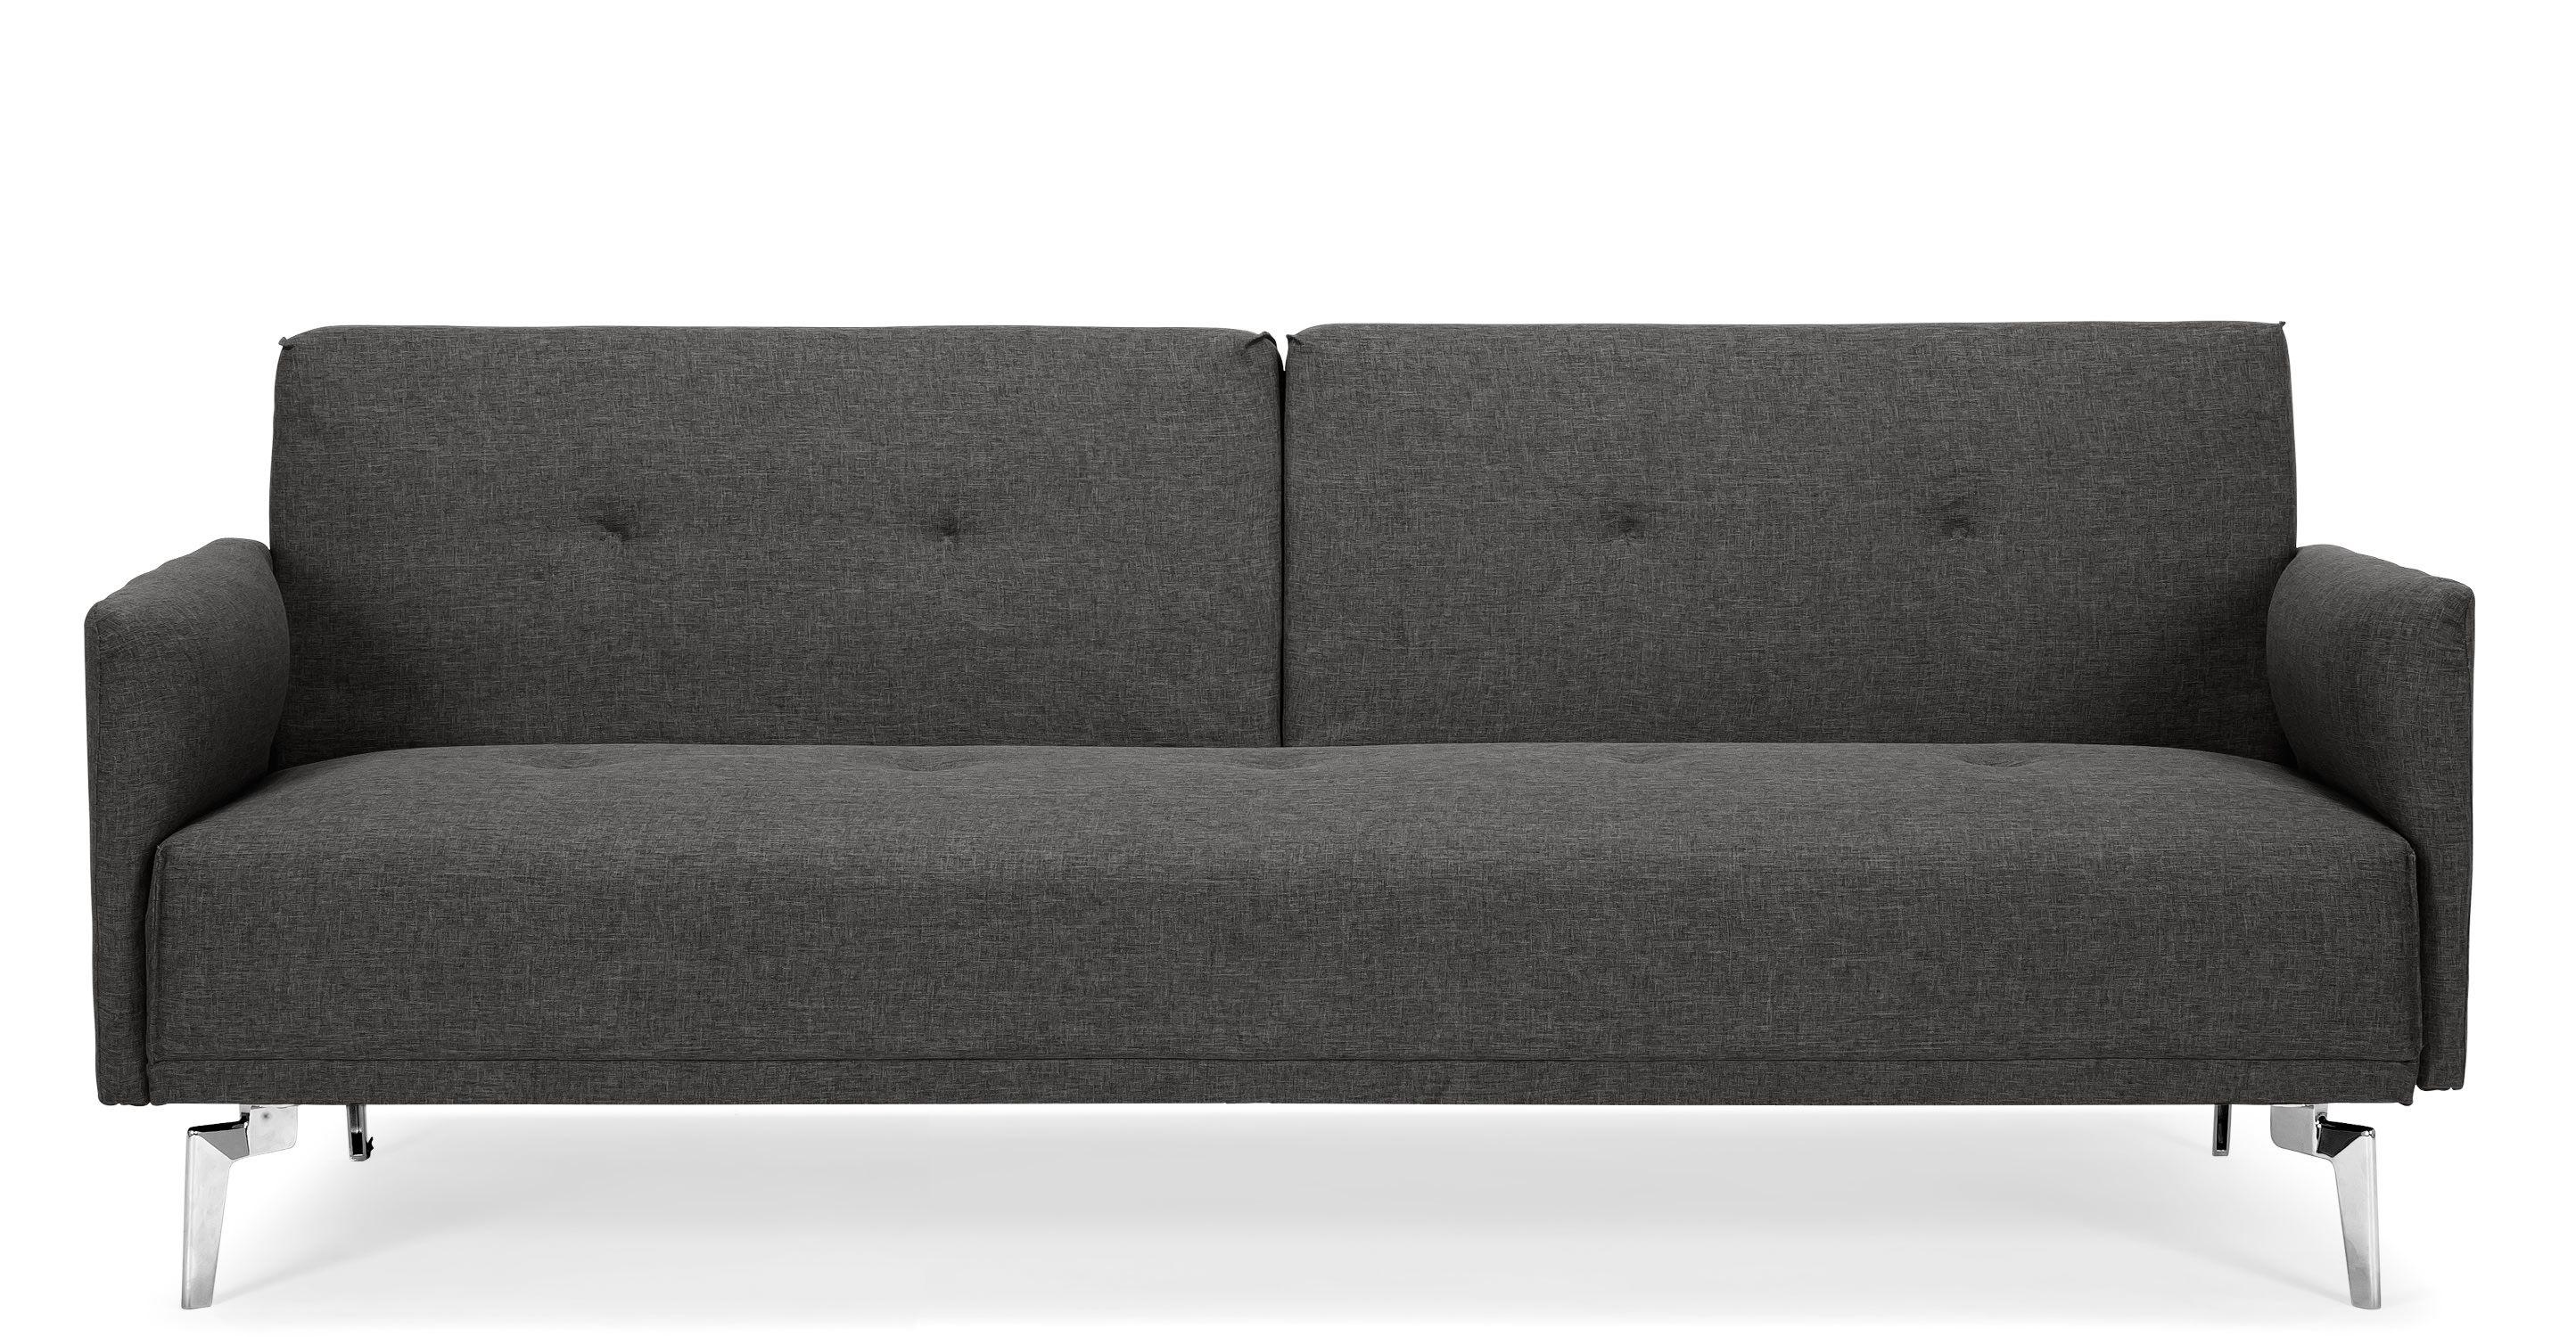 Pleasant Made Cygnet Grey Sofa Bed New House In 2019 Grey Sofa Machost Co Dining Chair Design Ideas Machostcouk